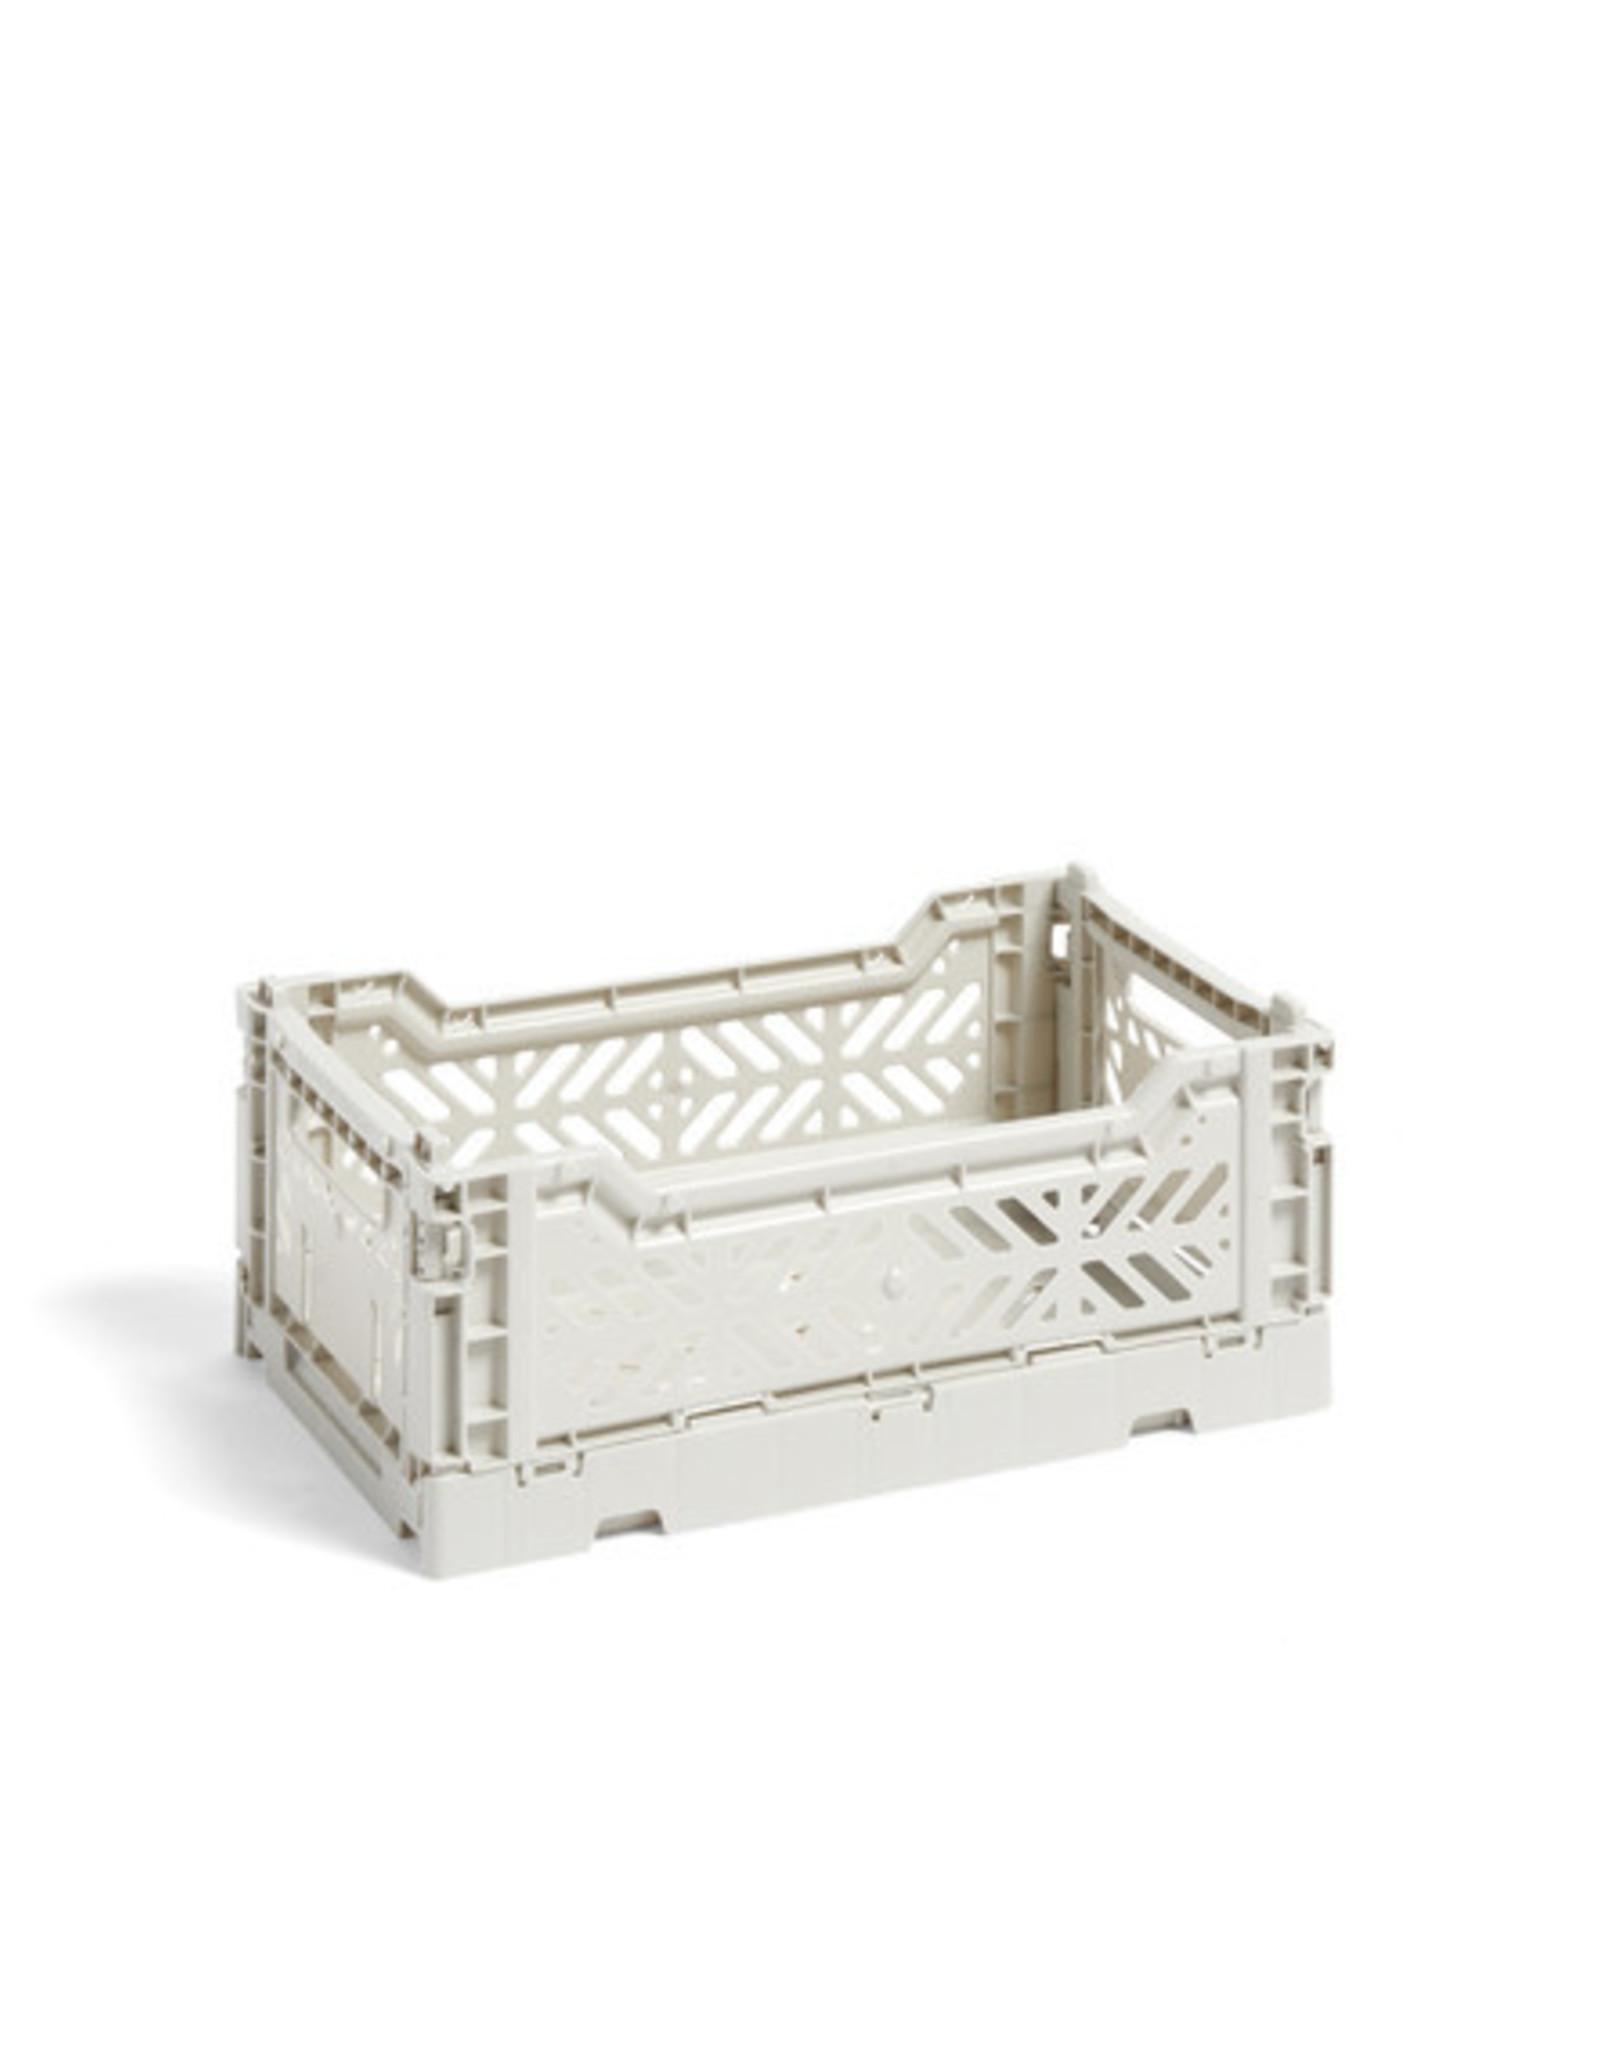 HAY HAY Colour Crate S light grey